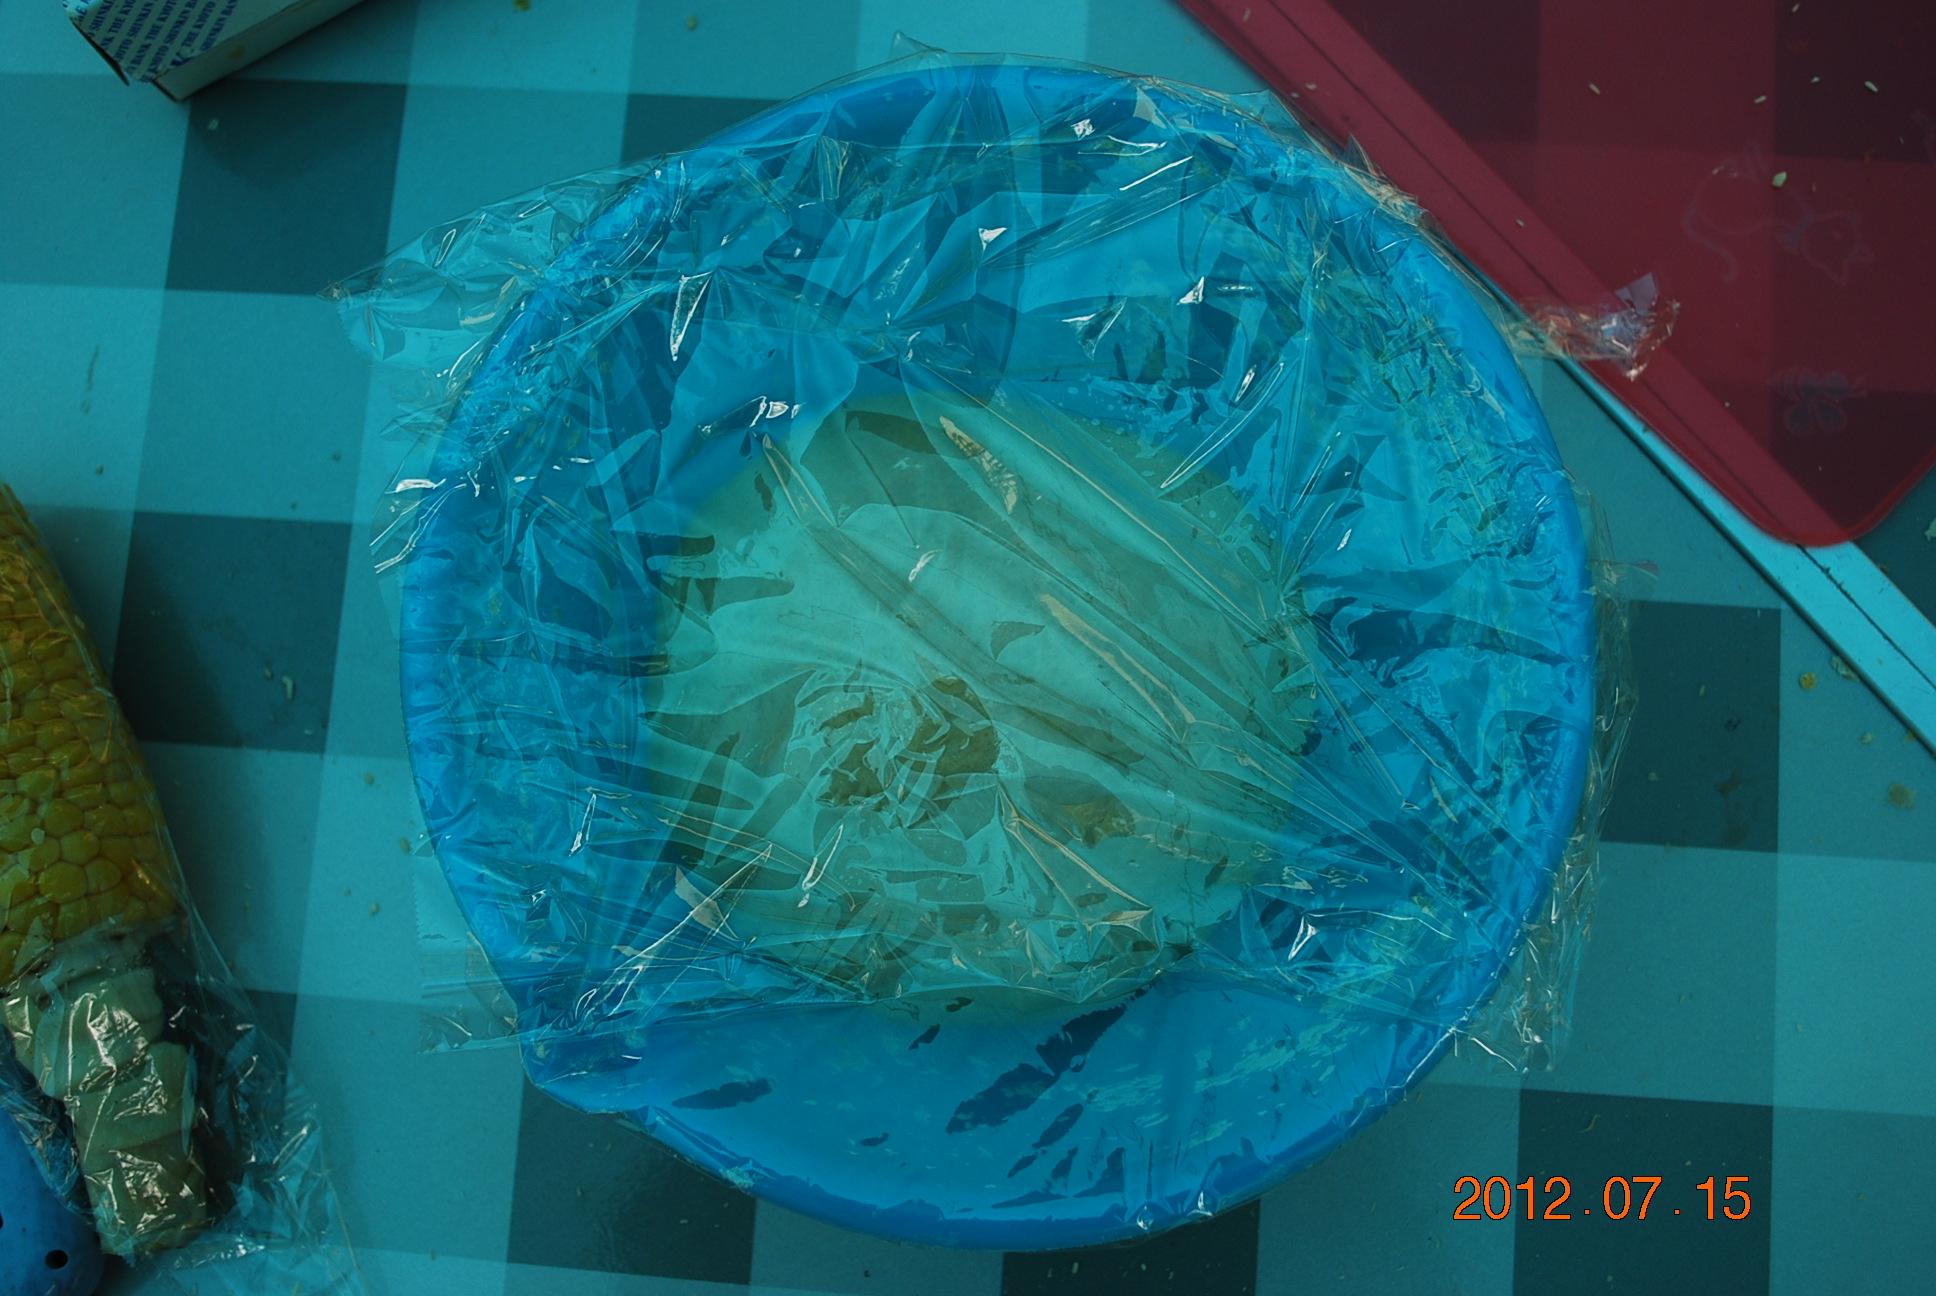 2012_0715_100438-DSC_0487.jpg